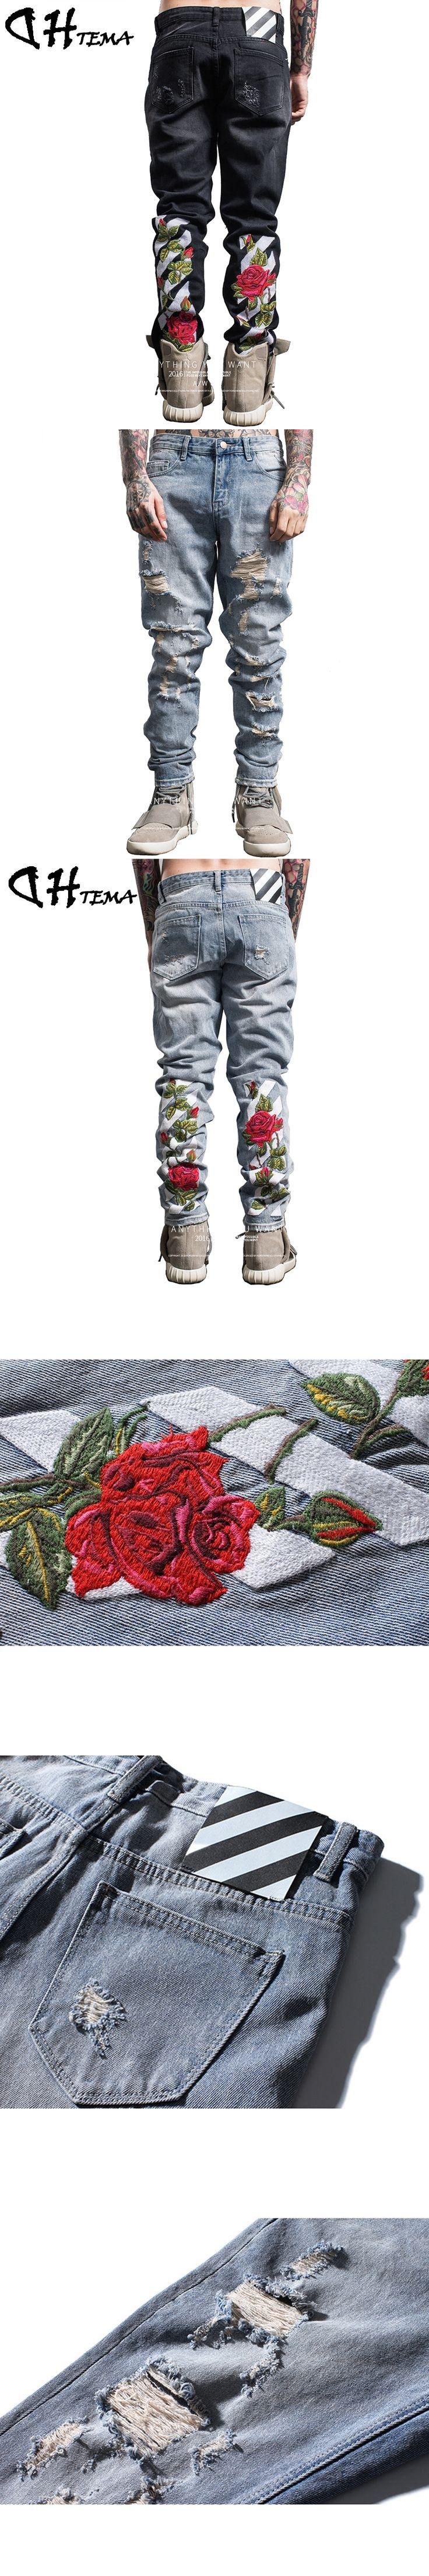 DHTEMA 2017 Embroidery Hip Hop Jeans Men Brand Clothing Male Black Denim Pants Top Quality Casual Denim Trousers